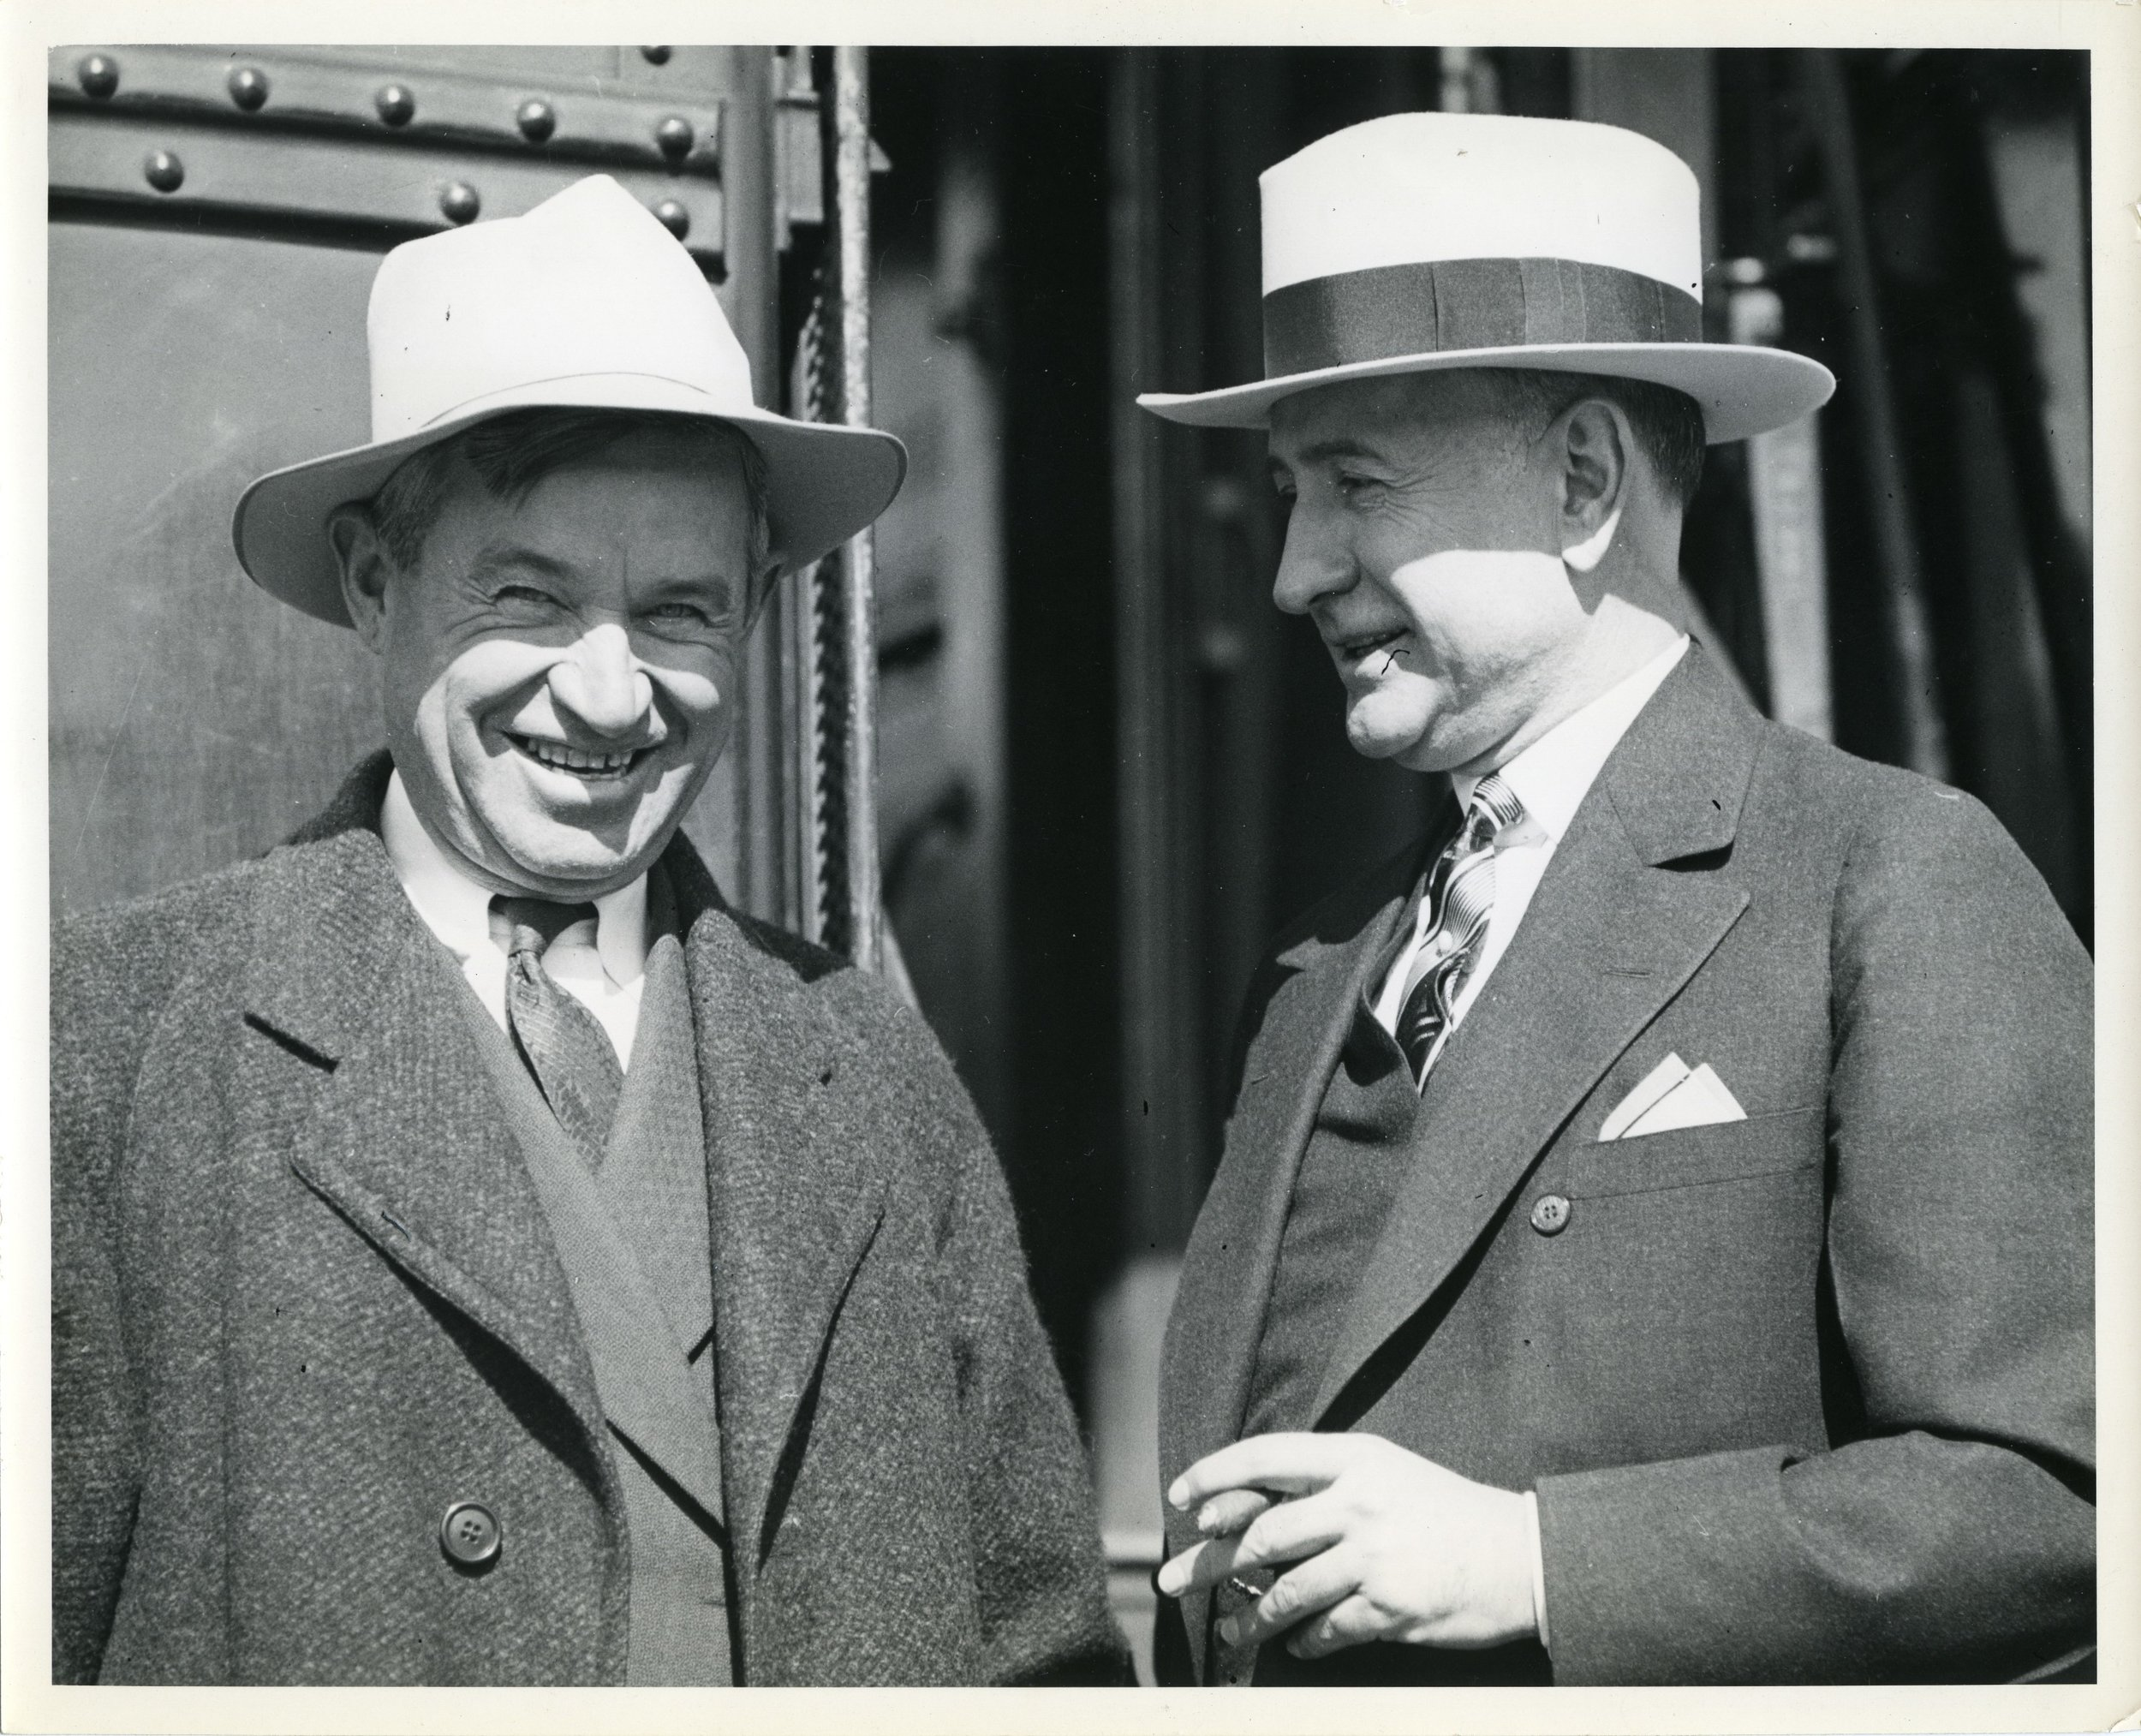 Rogers_Will_Folder_1_1928-1935_007 (1).jpg